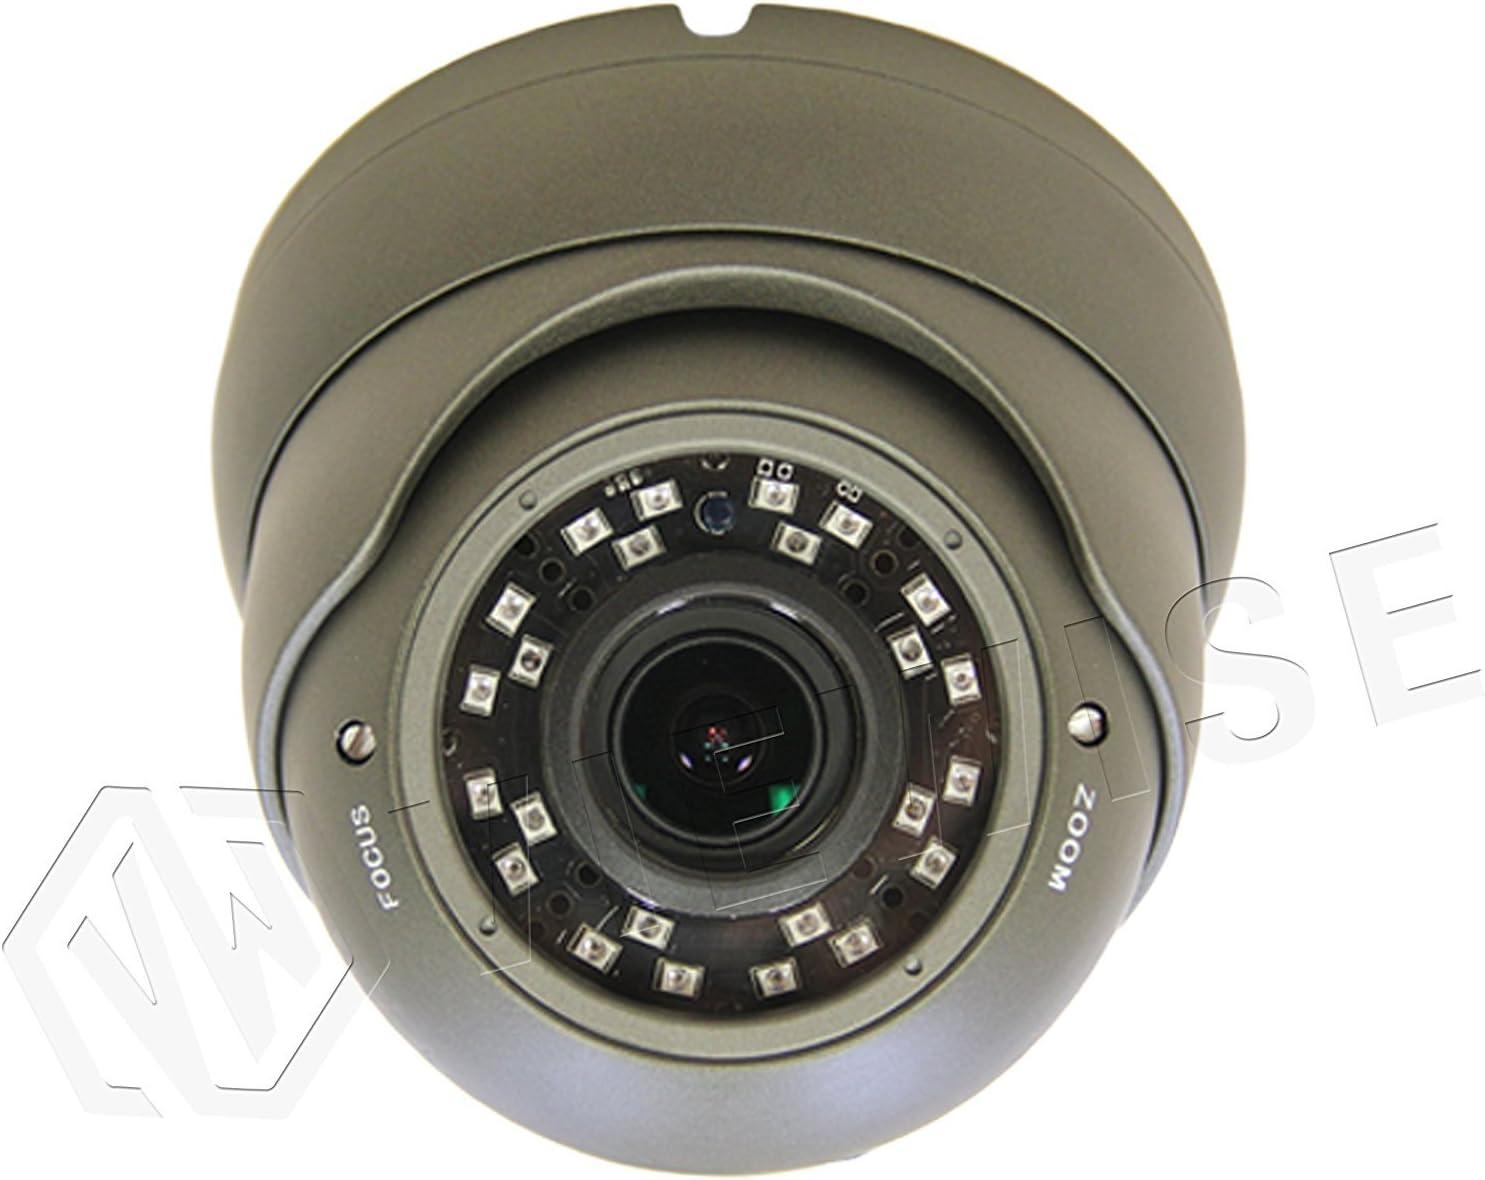 VIEWISE HD 1080P 2MP SONY Sensor Indoor Outdoor Surveillance Security Camera Video Monitoring Day Night Vision 4-in-1 HD-TVI AHD CVI 1200TVL Eyeball Turret Dome 2.8 12mm Varifocal Lens Gray